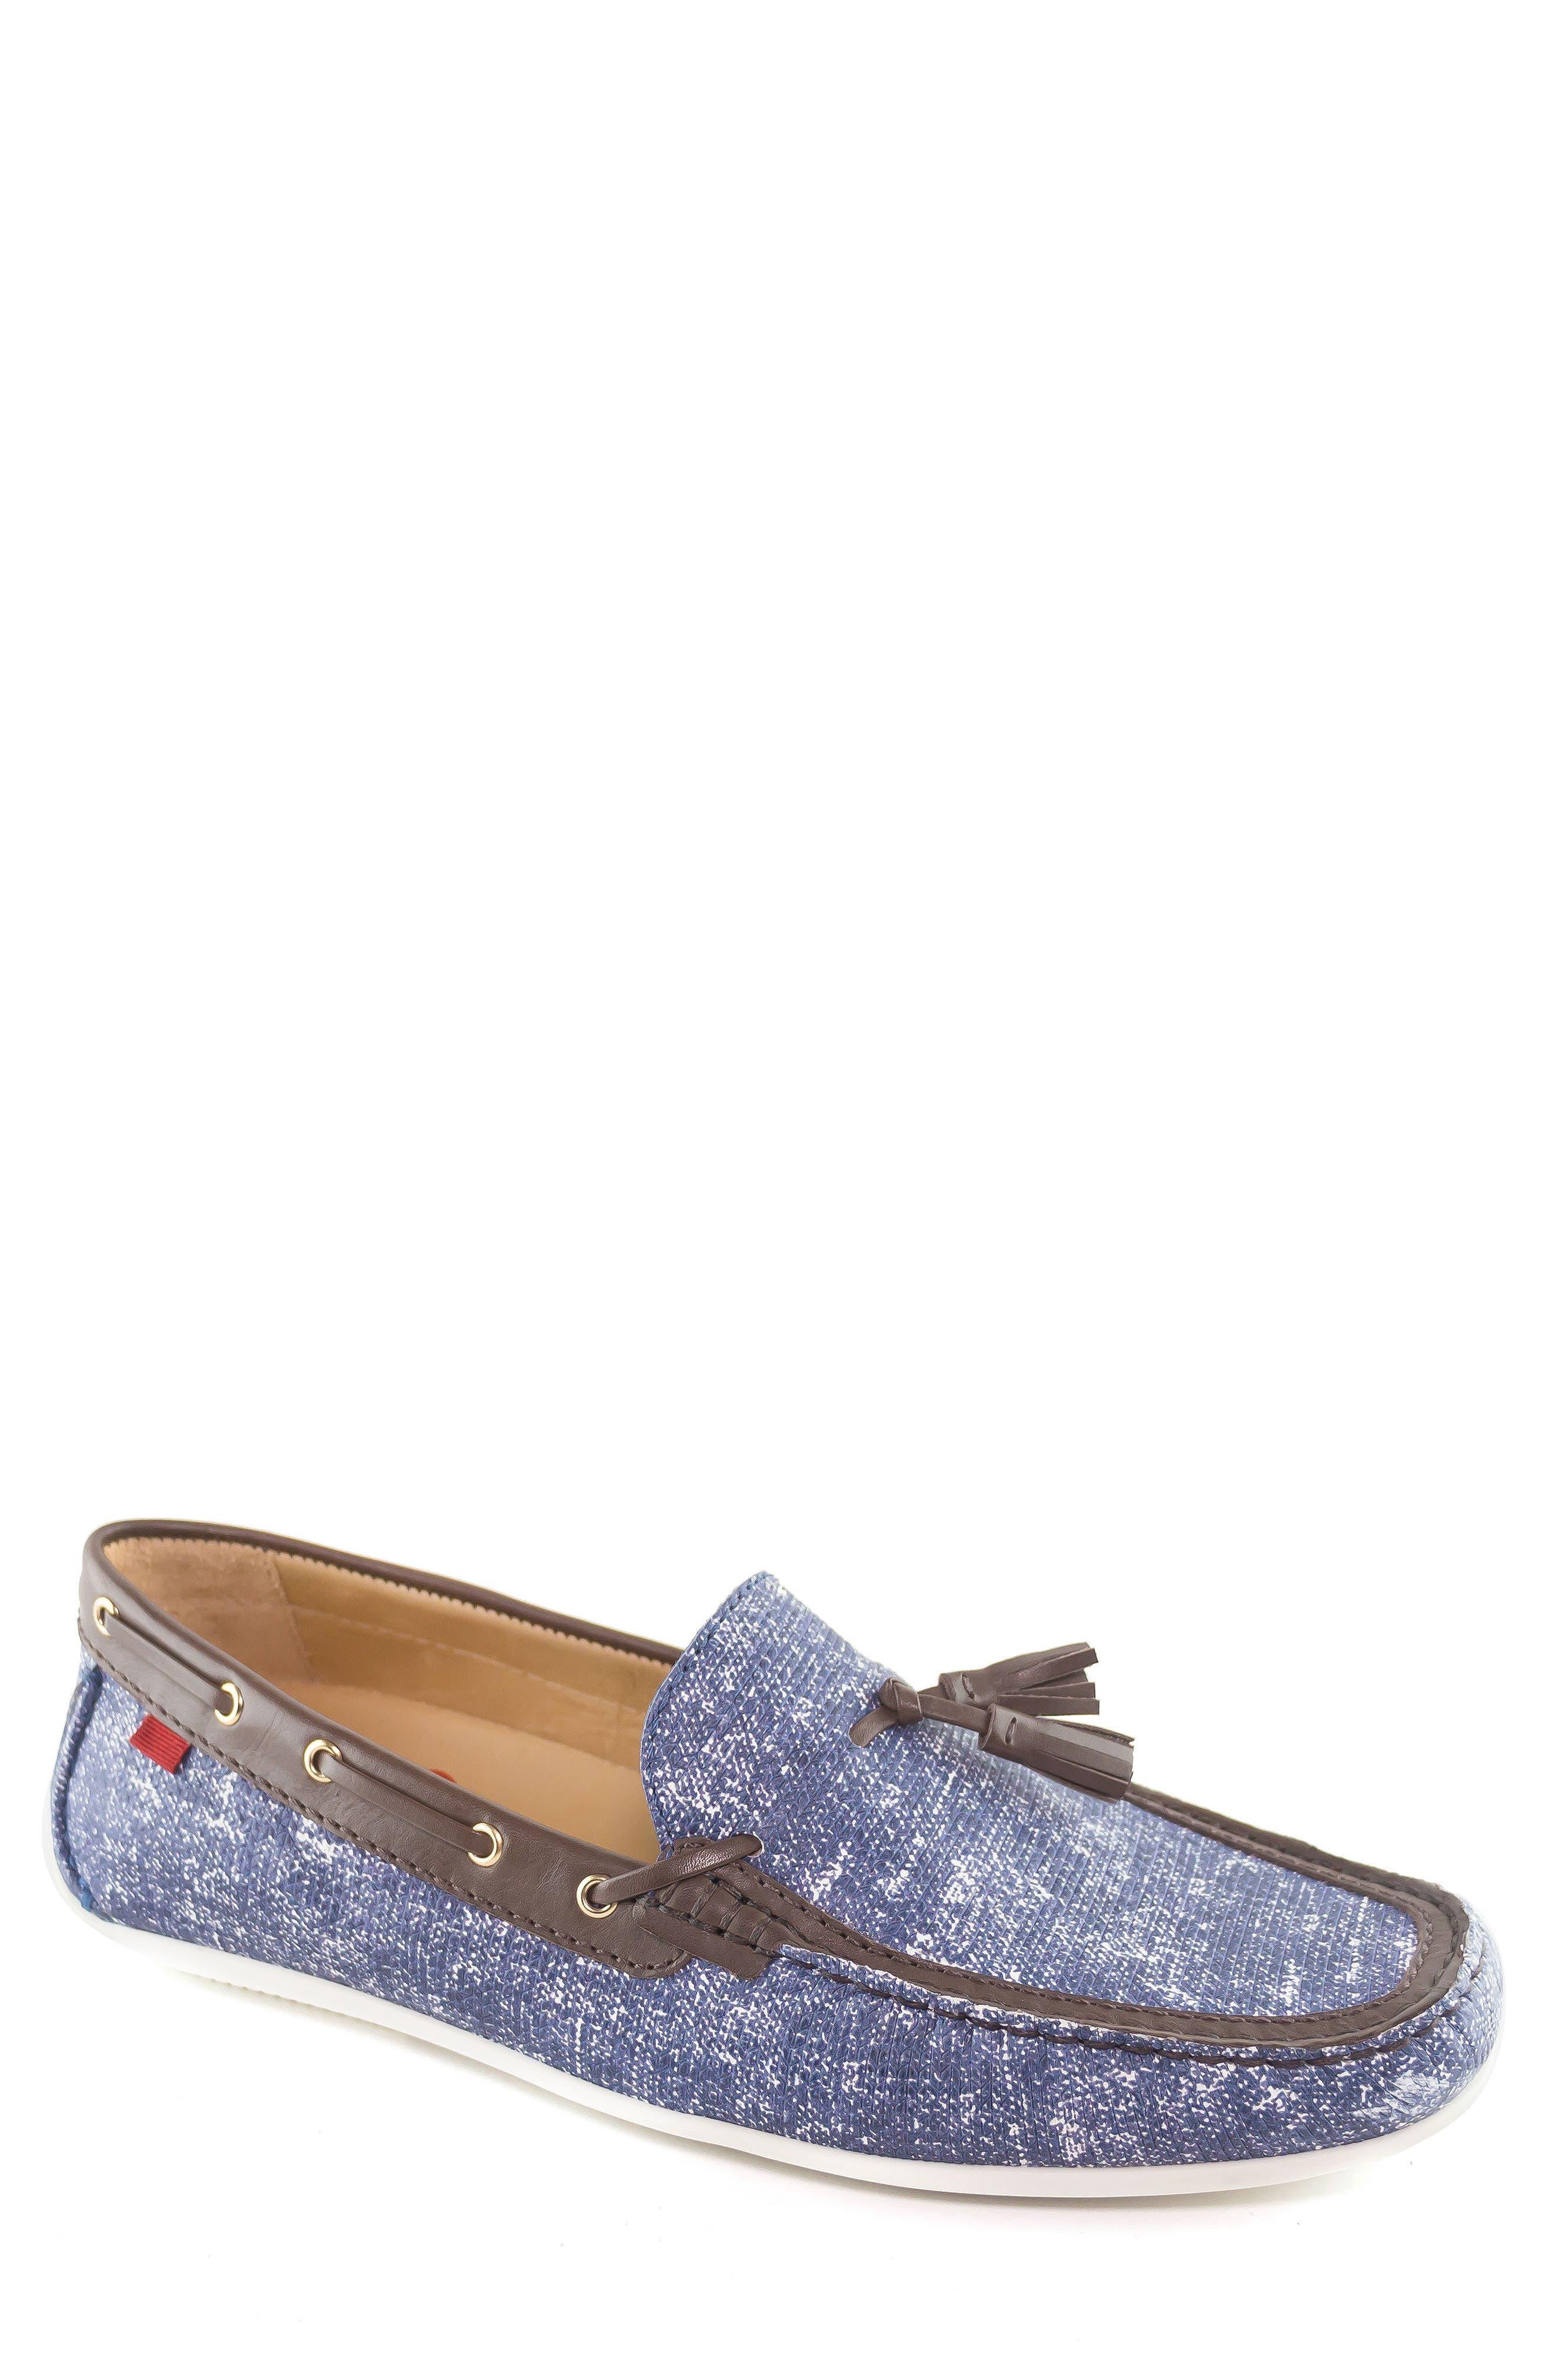 Bushwick Tasseled Driving Loafer,                             Main thumbnail 1, color,                             Jeans Blue